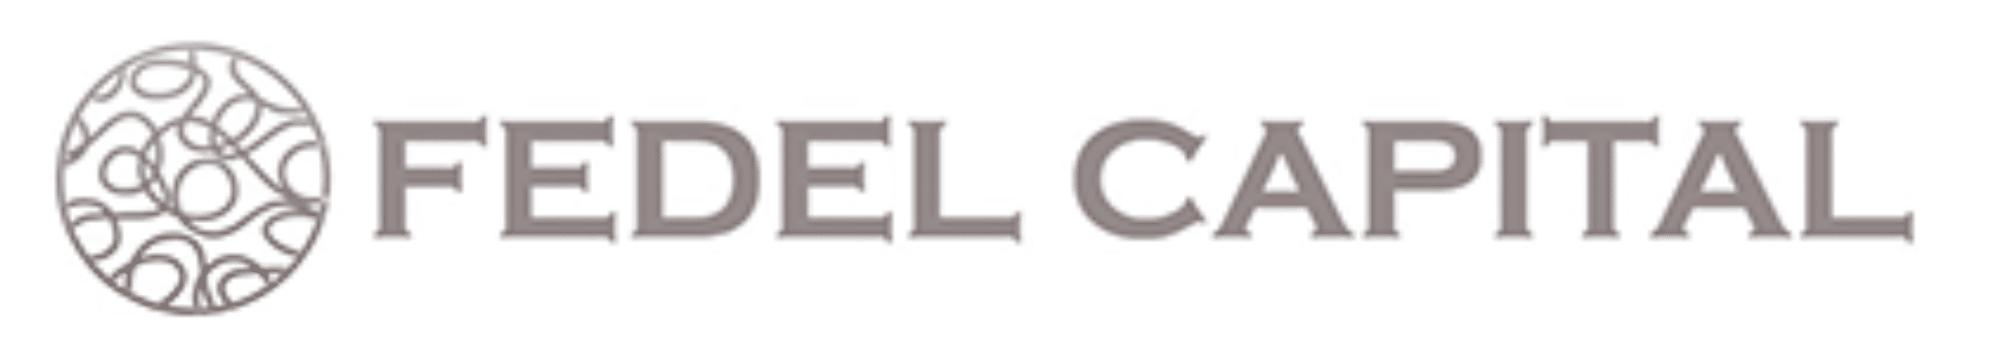 FEDEL CAPITAL Pte.Ltd.日本支社